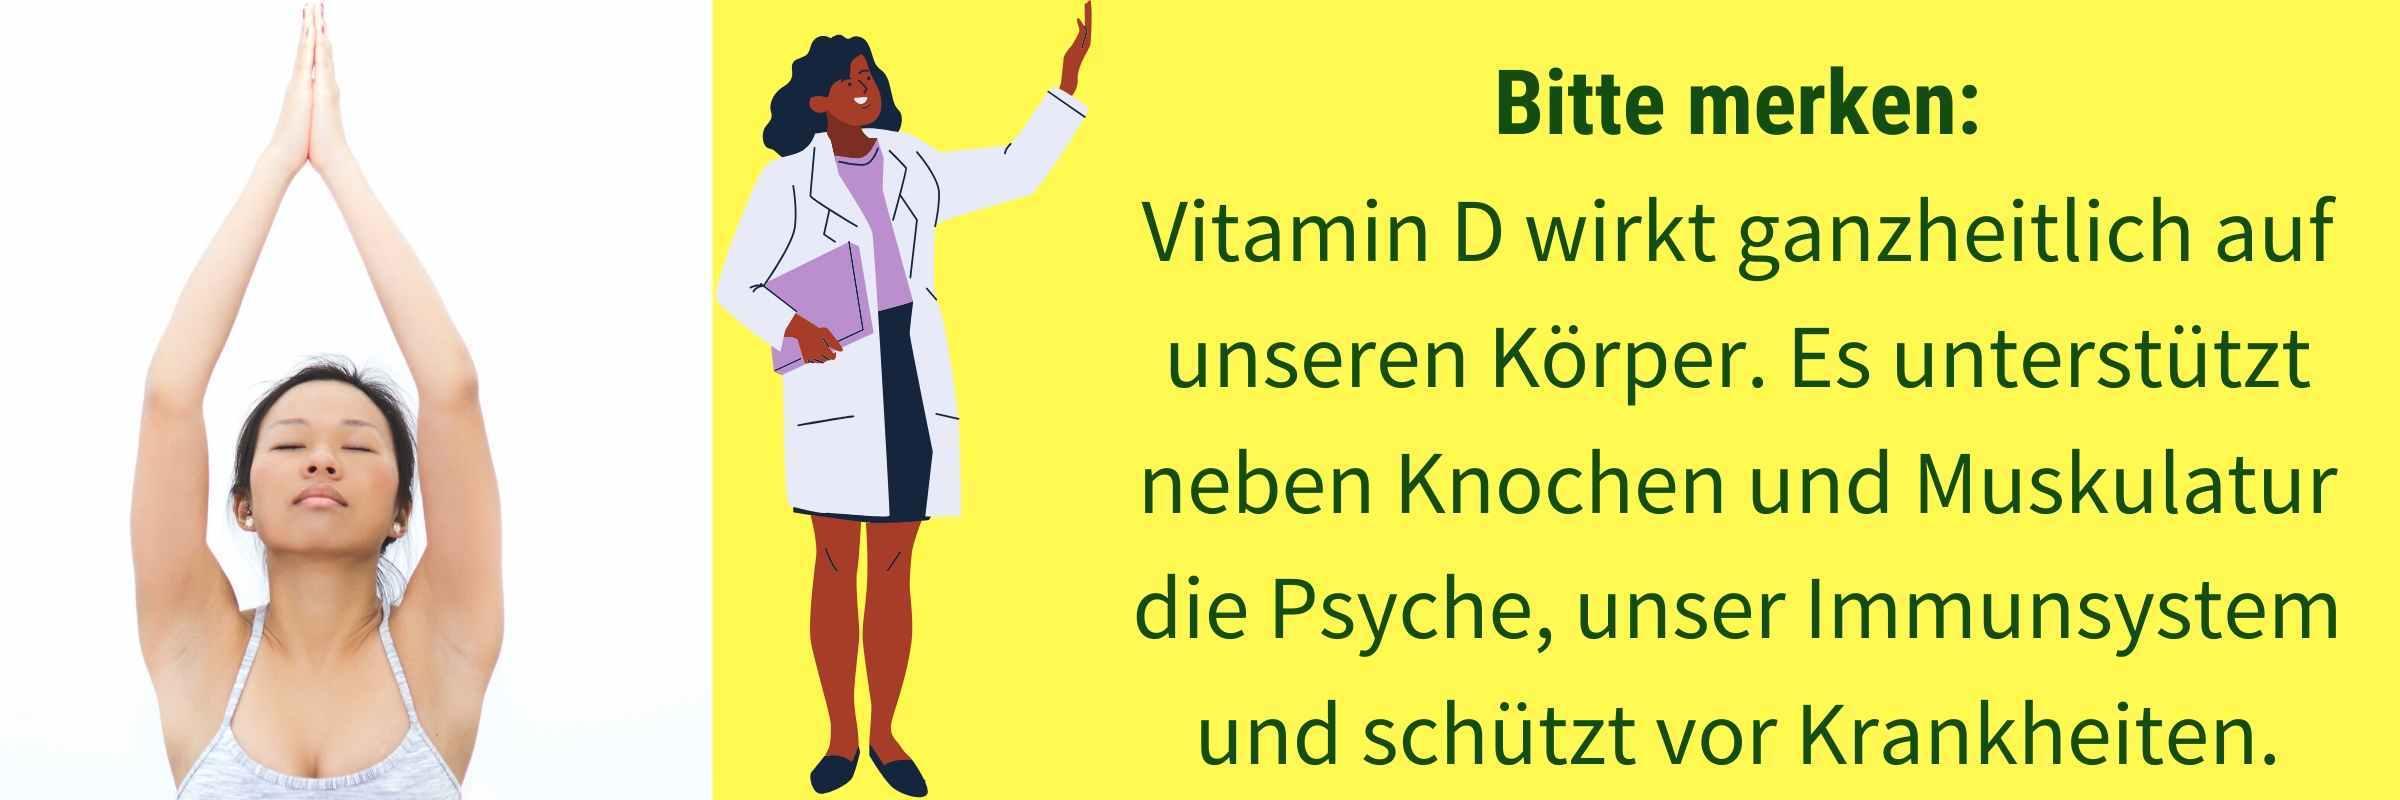 Wirkung Vitamin D